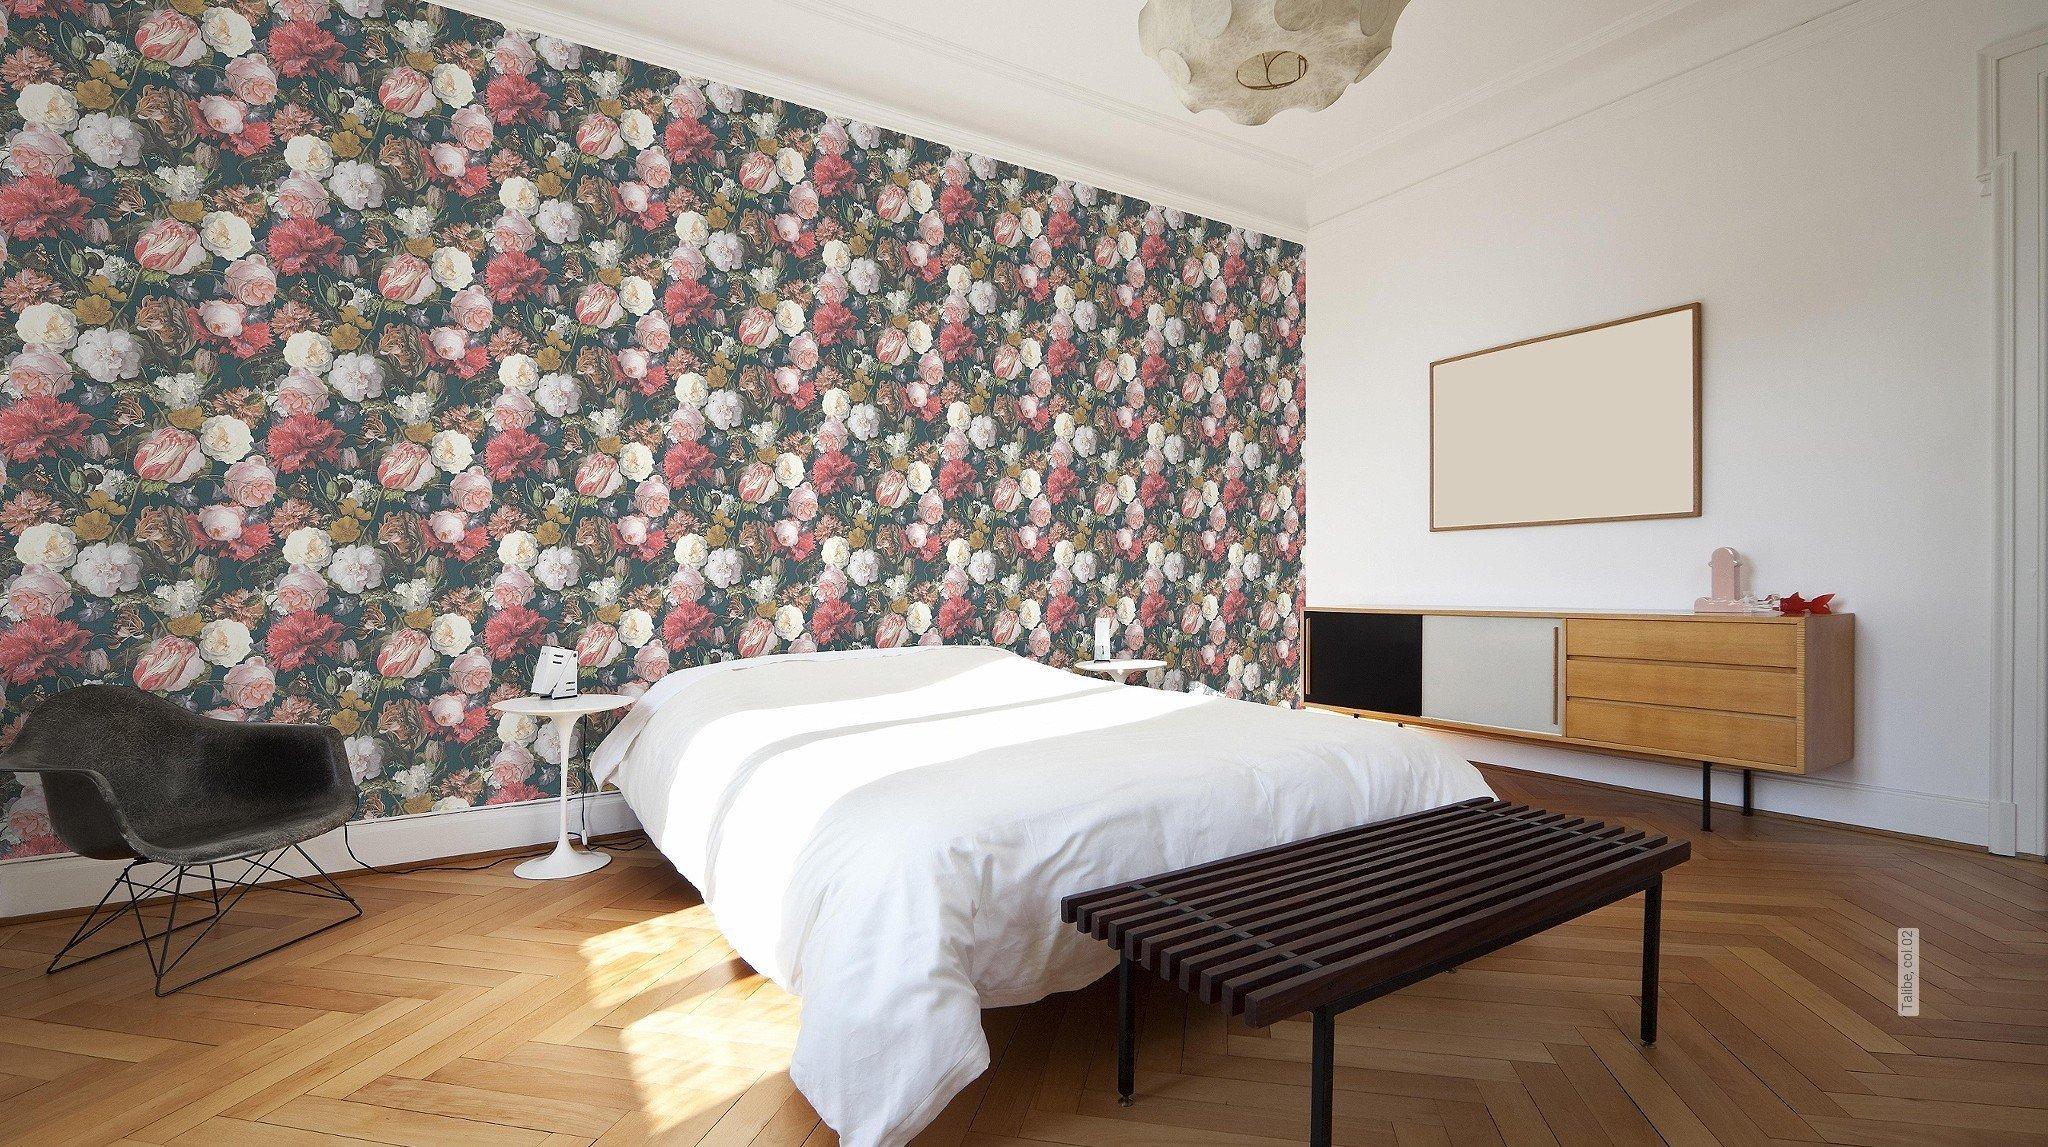 florale muster tapeten mit dem besonderen die. Black Bedroom Furniture Sets. Home Design Ideas